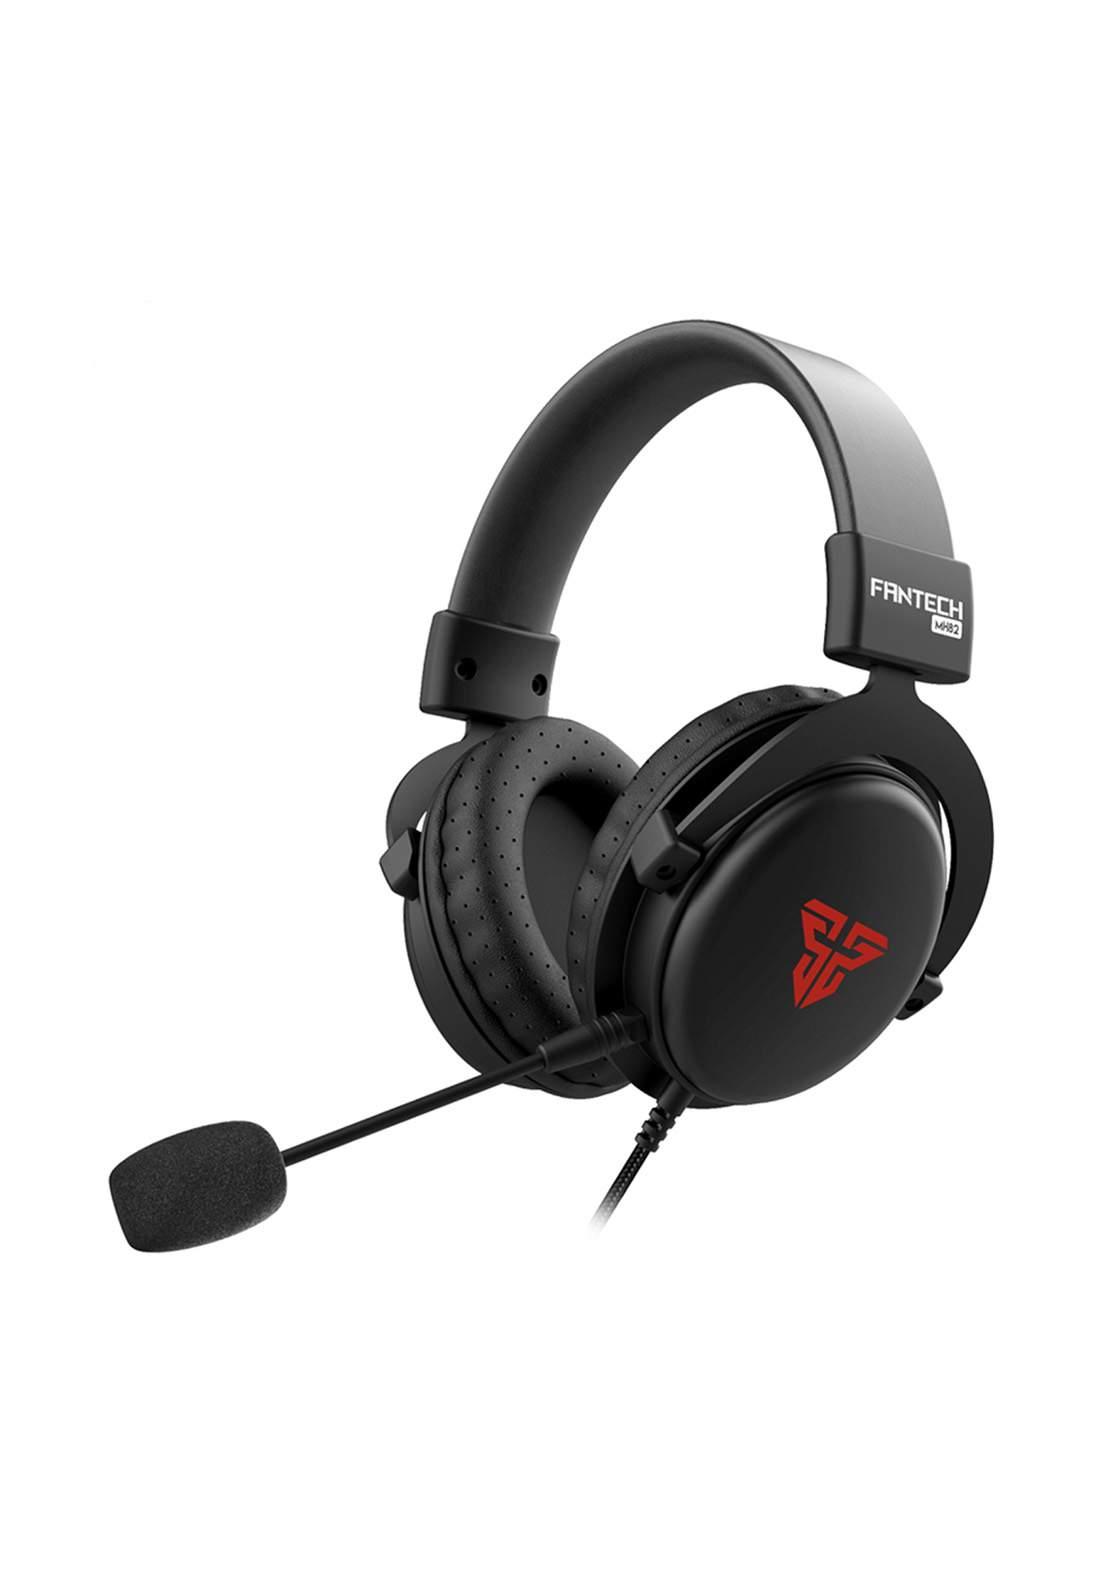 Fantech MH82 ECHO Gaming Headphones - Black سماعة